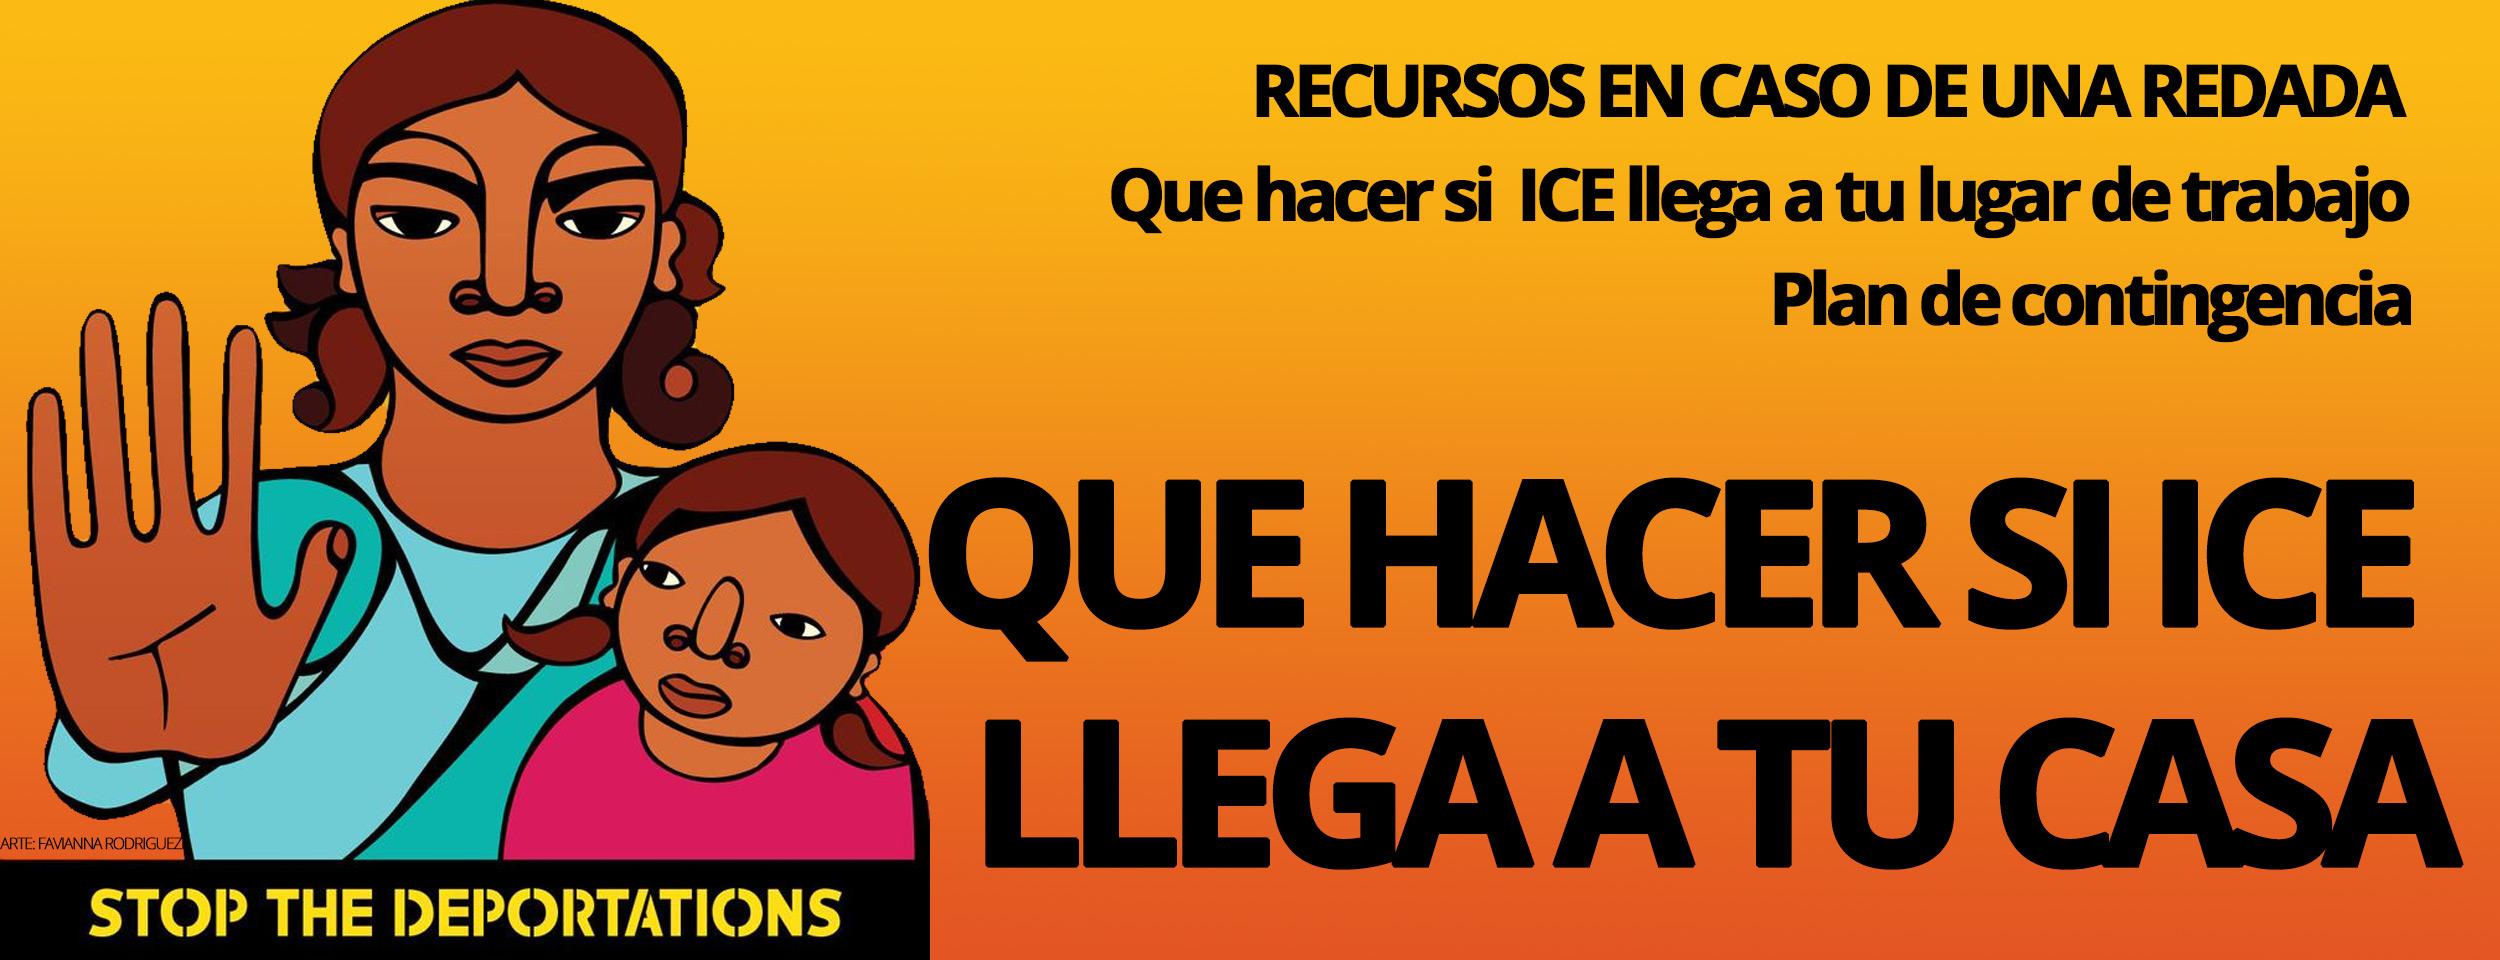 ICE RECURSOS